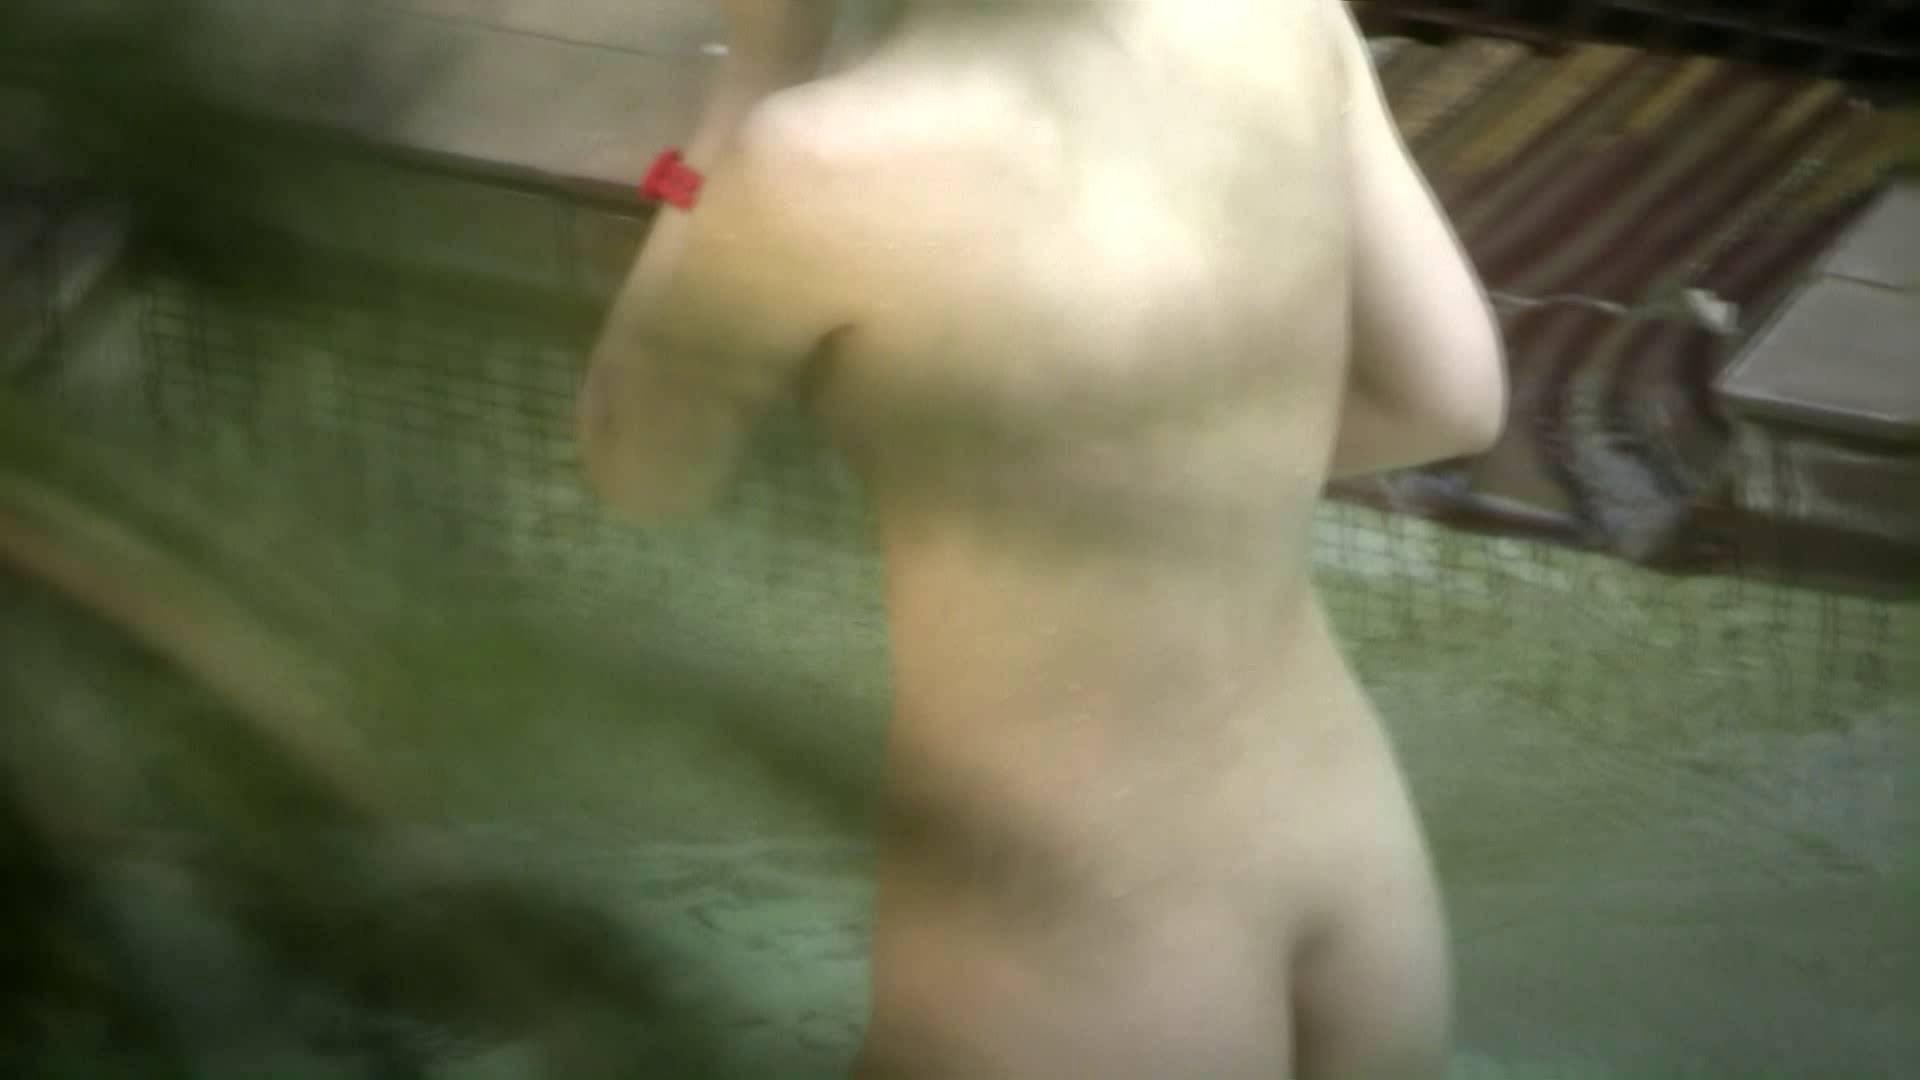 Aquaな露天風呂Vol.652 盗撮 | HなOL  105pic 64